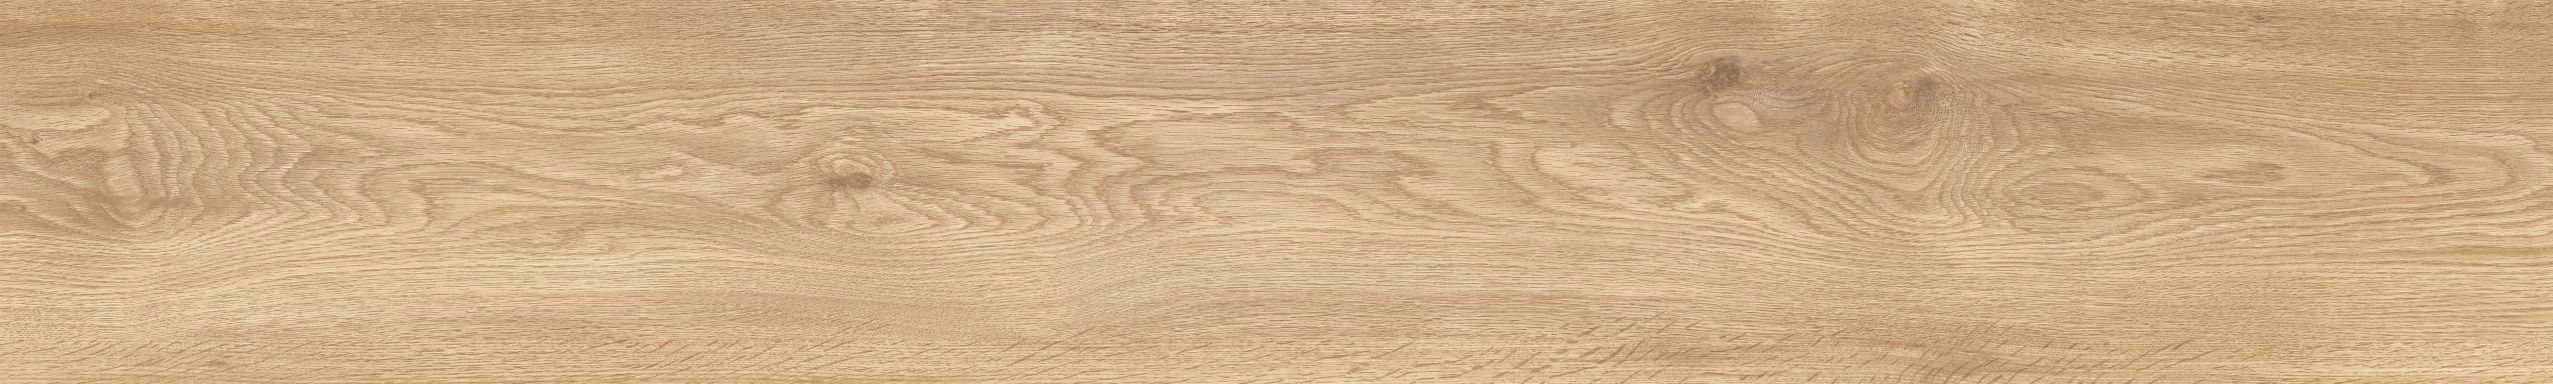 Panele winylowe LVT modulari ® WOOD DRYBACK 19,6 x 132 cm 24245